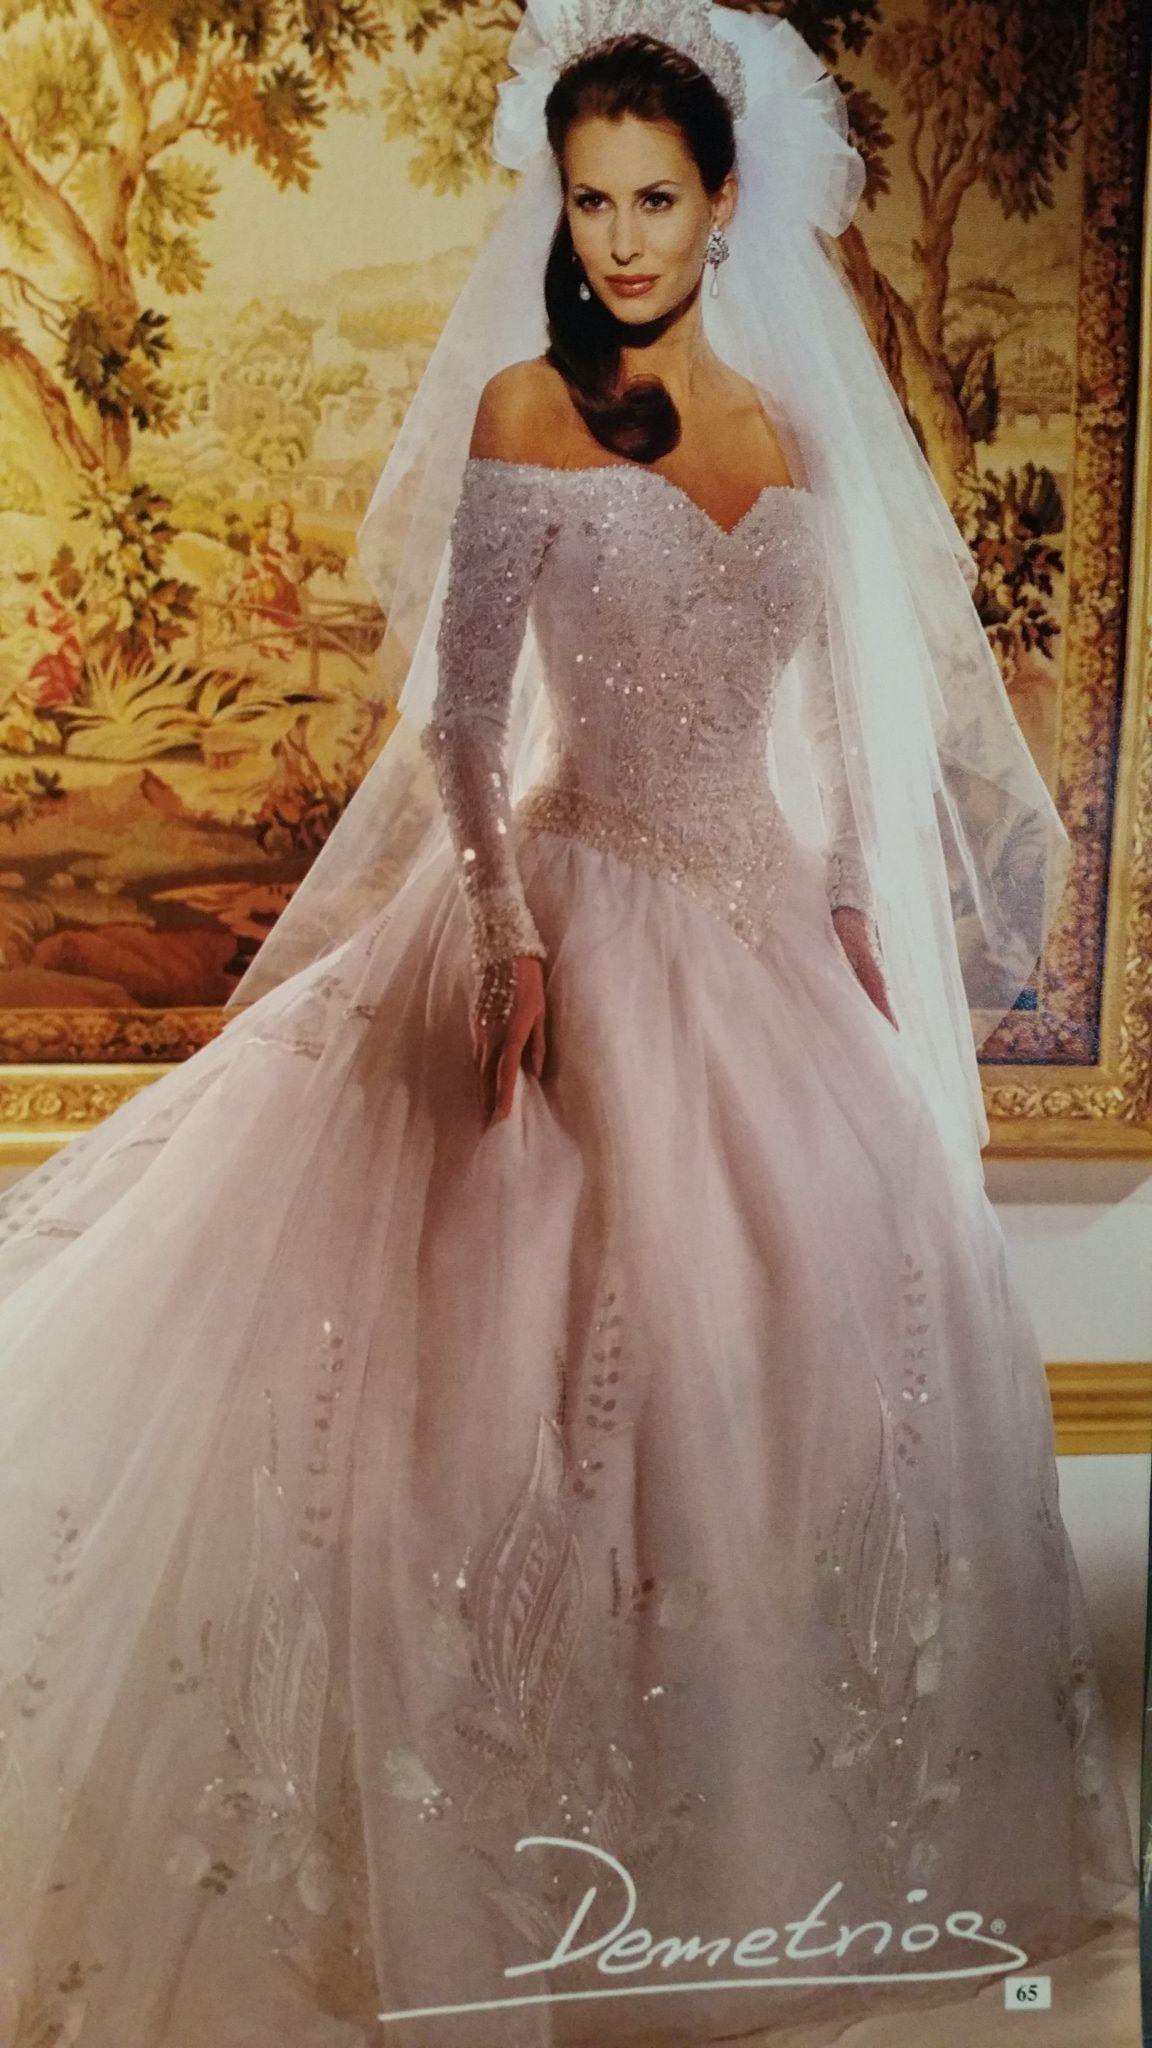 Demitrious Wedding Gowns.Demetrios 1995 Demetrios In 2019 Antique Wedding Dresses